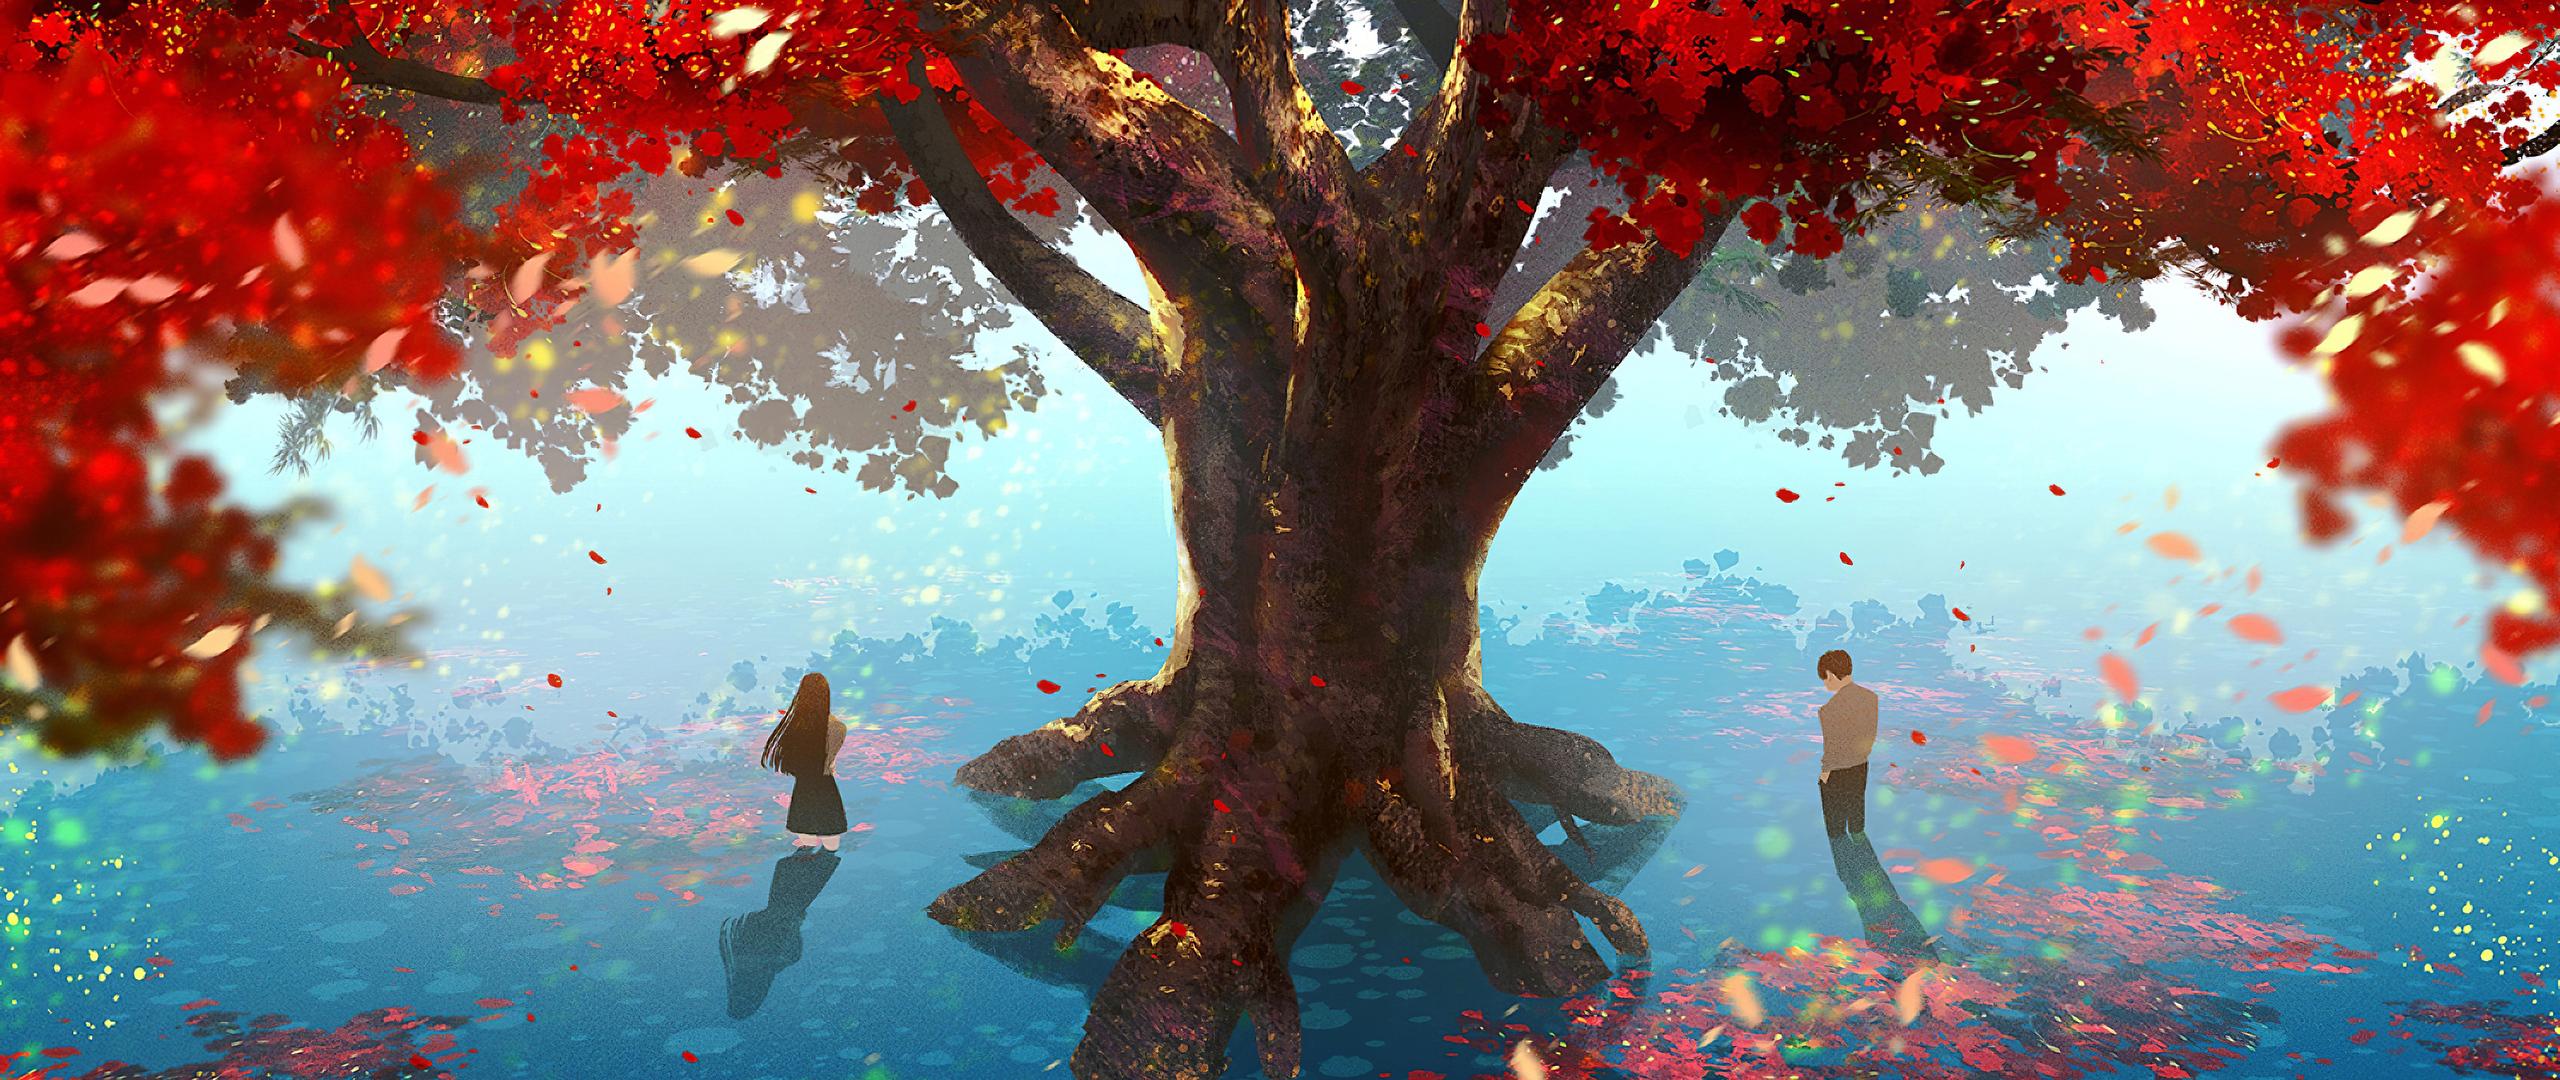 love-memories-with-tree-4k-ij.jpg